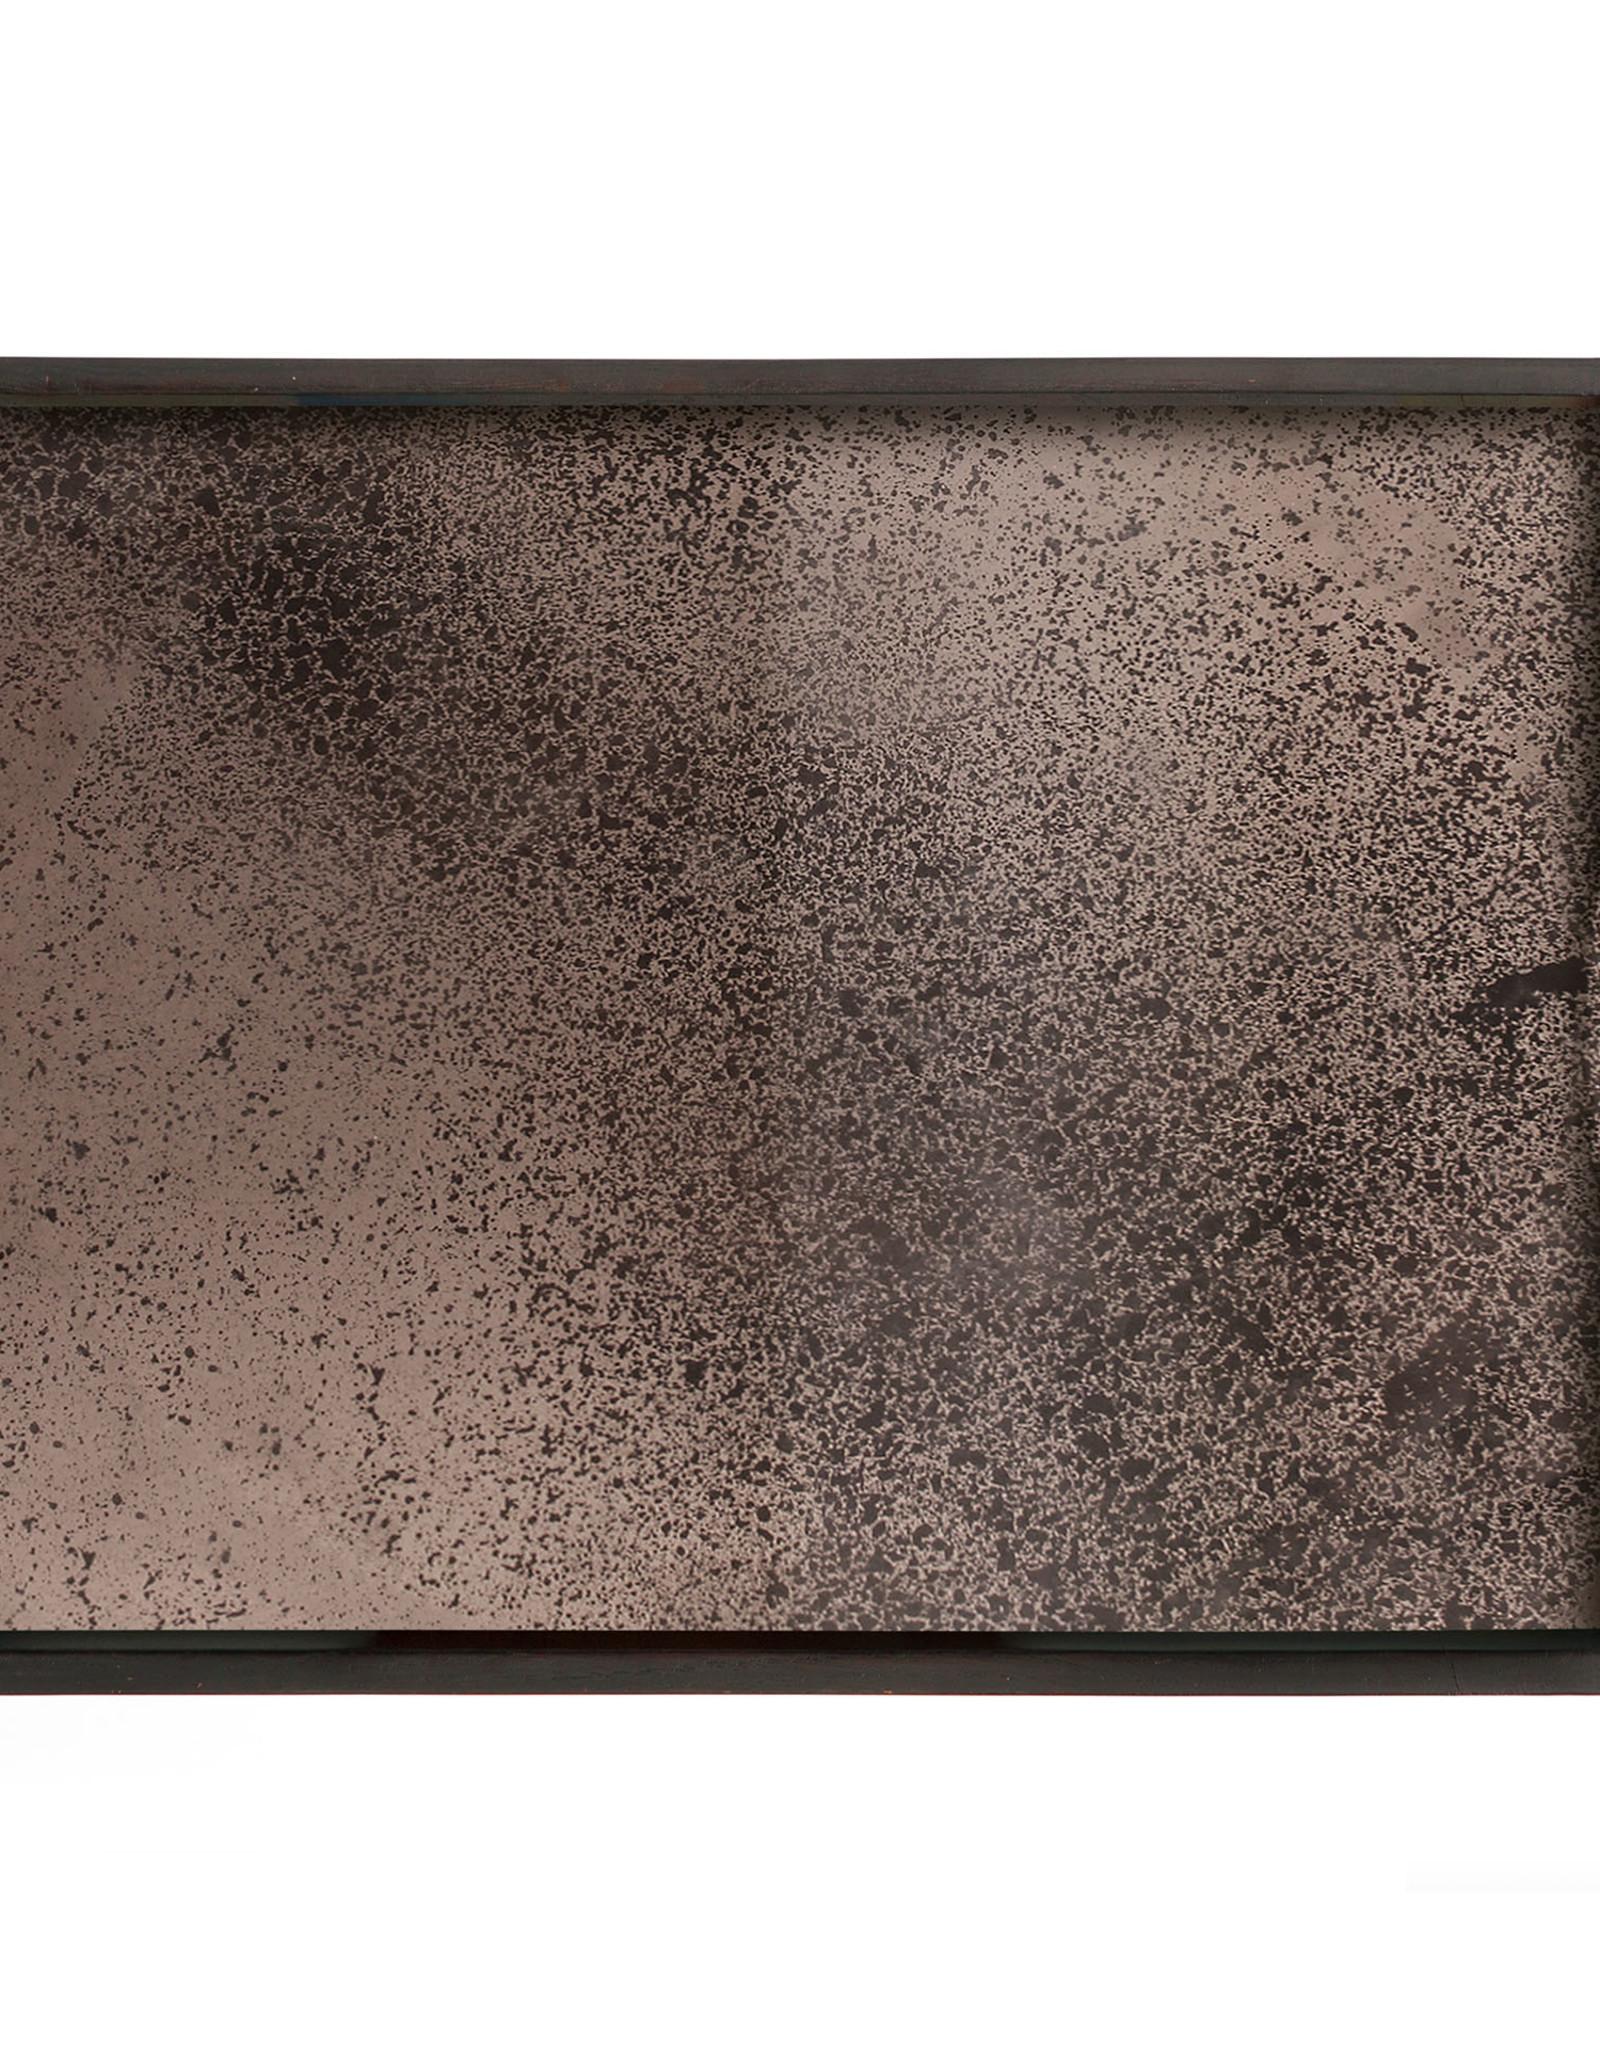 Bronze mirror tray - rectangular - S 18 x 14 x 2